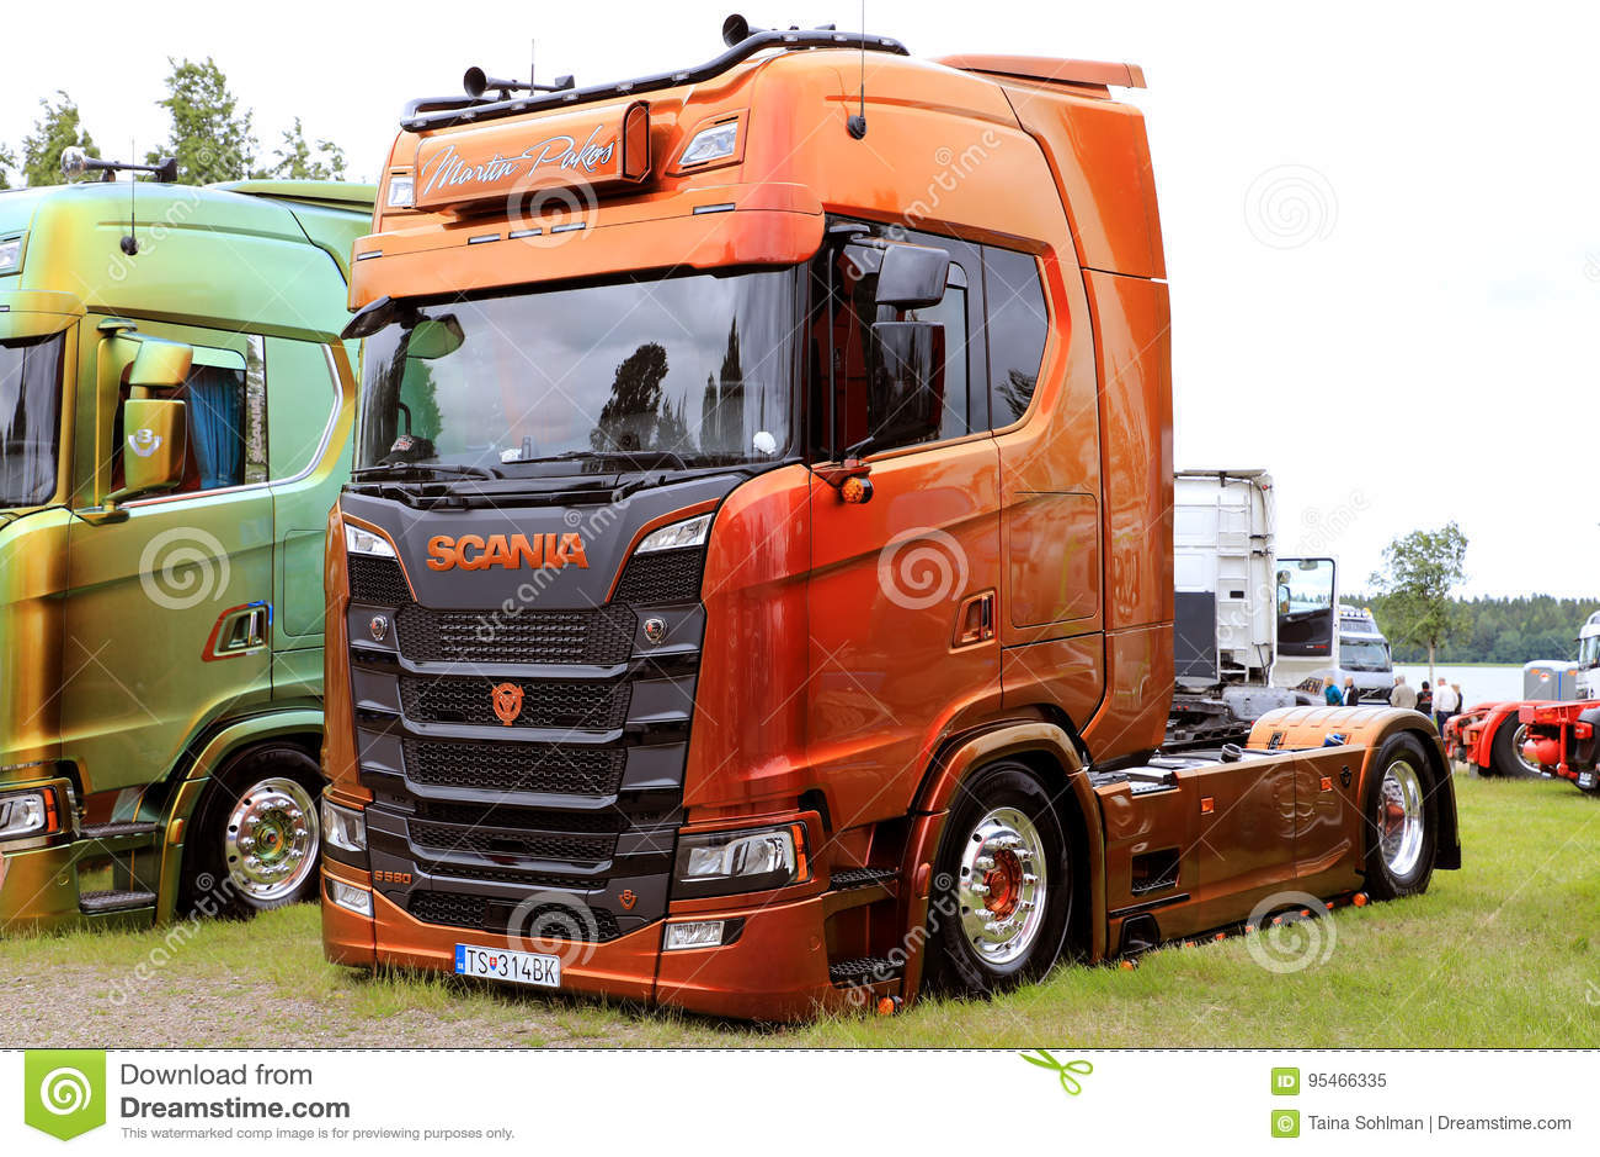 Brown Customized Scania S580 of Martin Pakos Show Truck